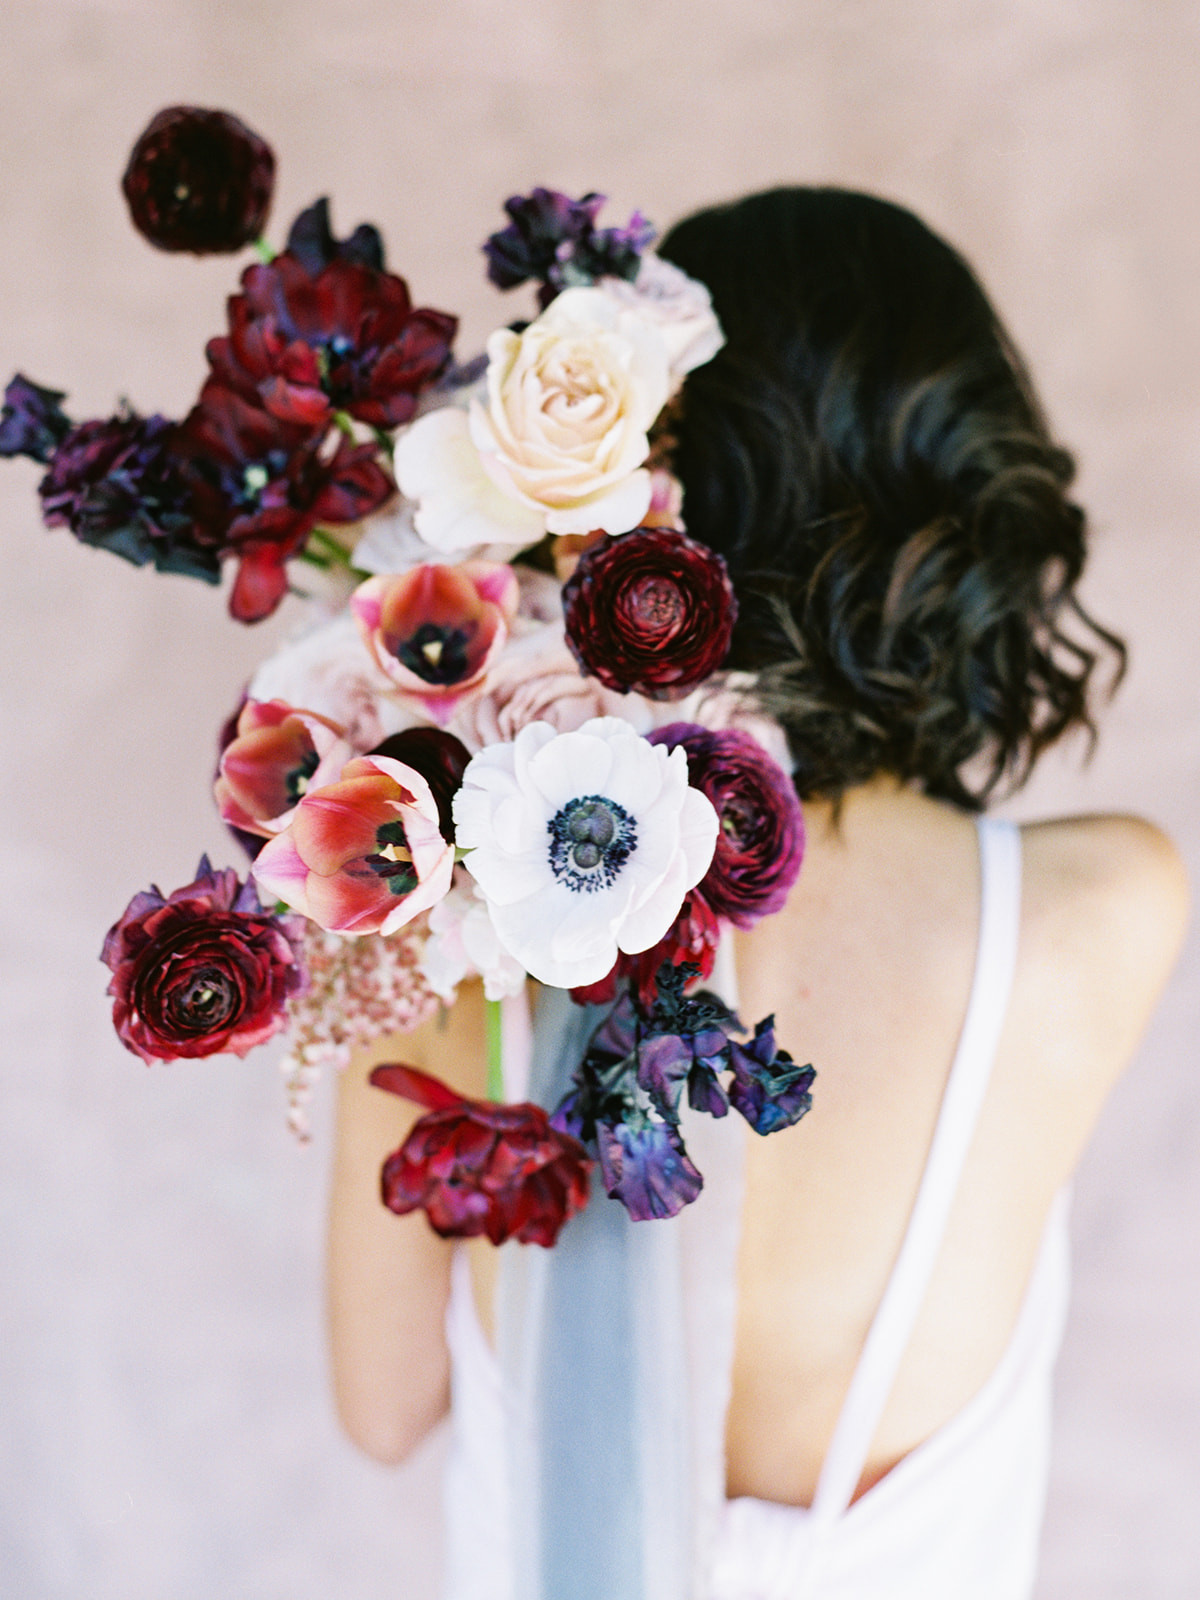 sandra-chau-stylist-fine-art-editorial-shoot-wedding-inspiration-redflowers-unearthingtc-2.jpg